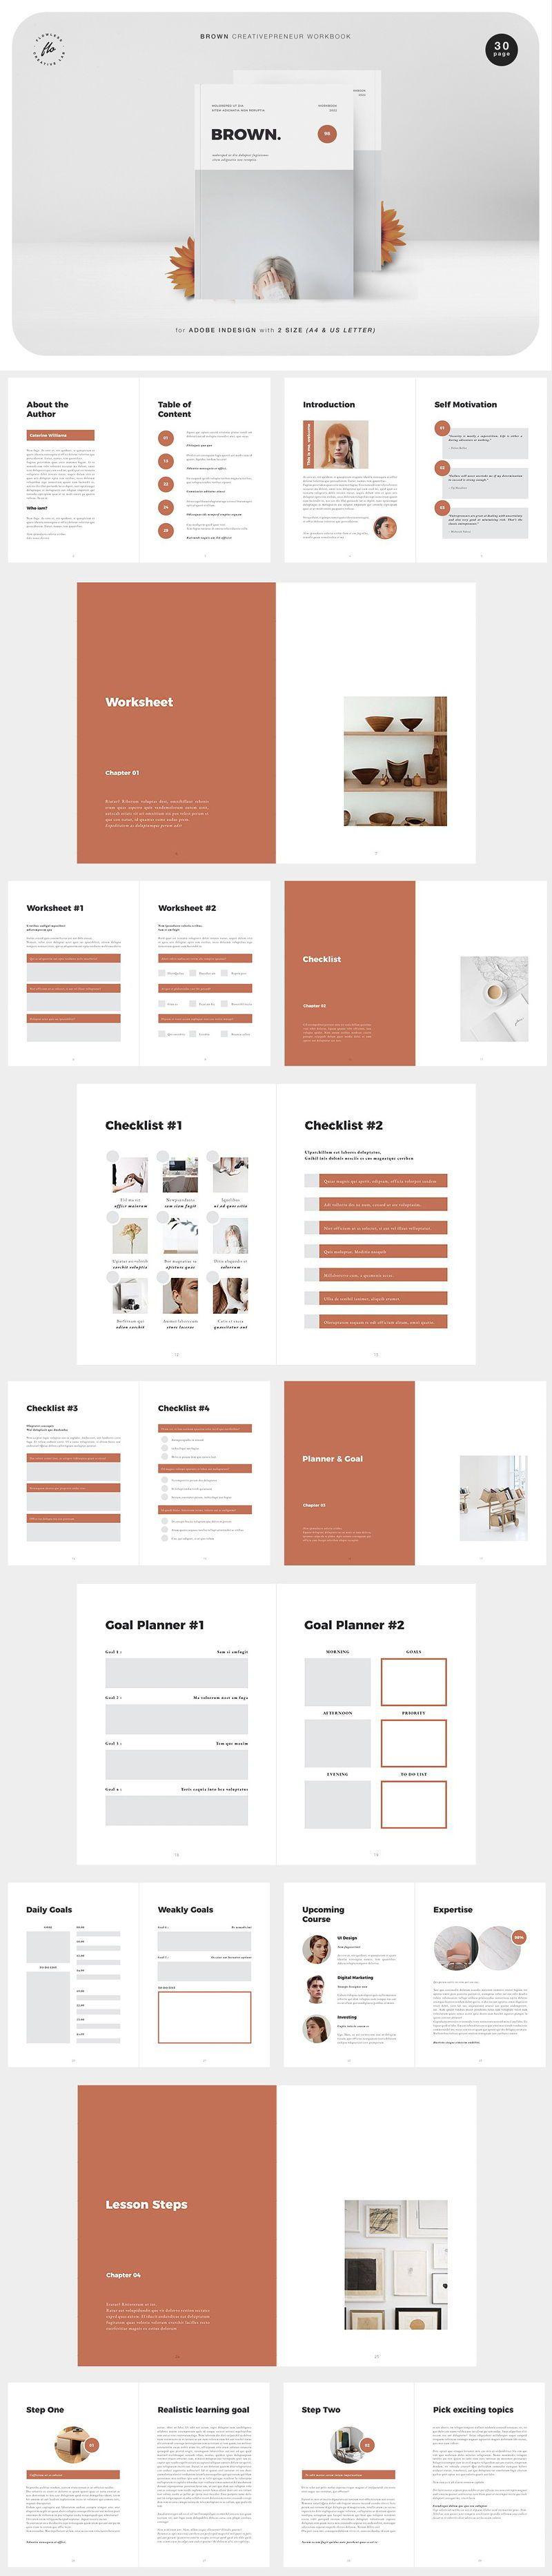 BROWN Creativepreneur Workbook Indesign